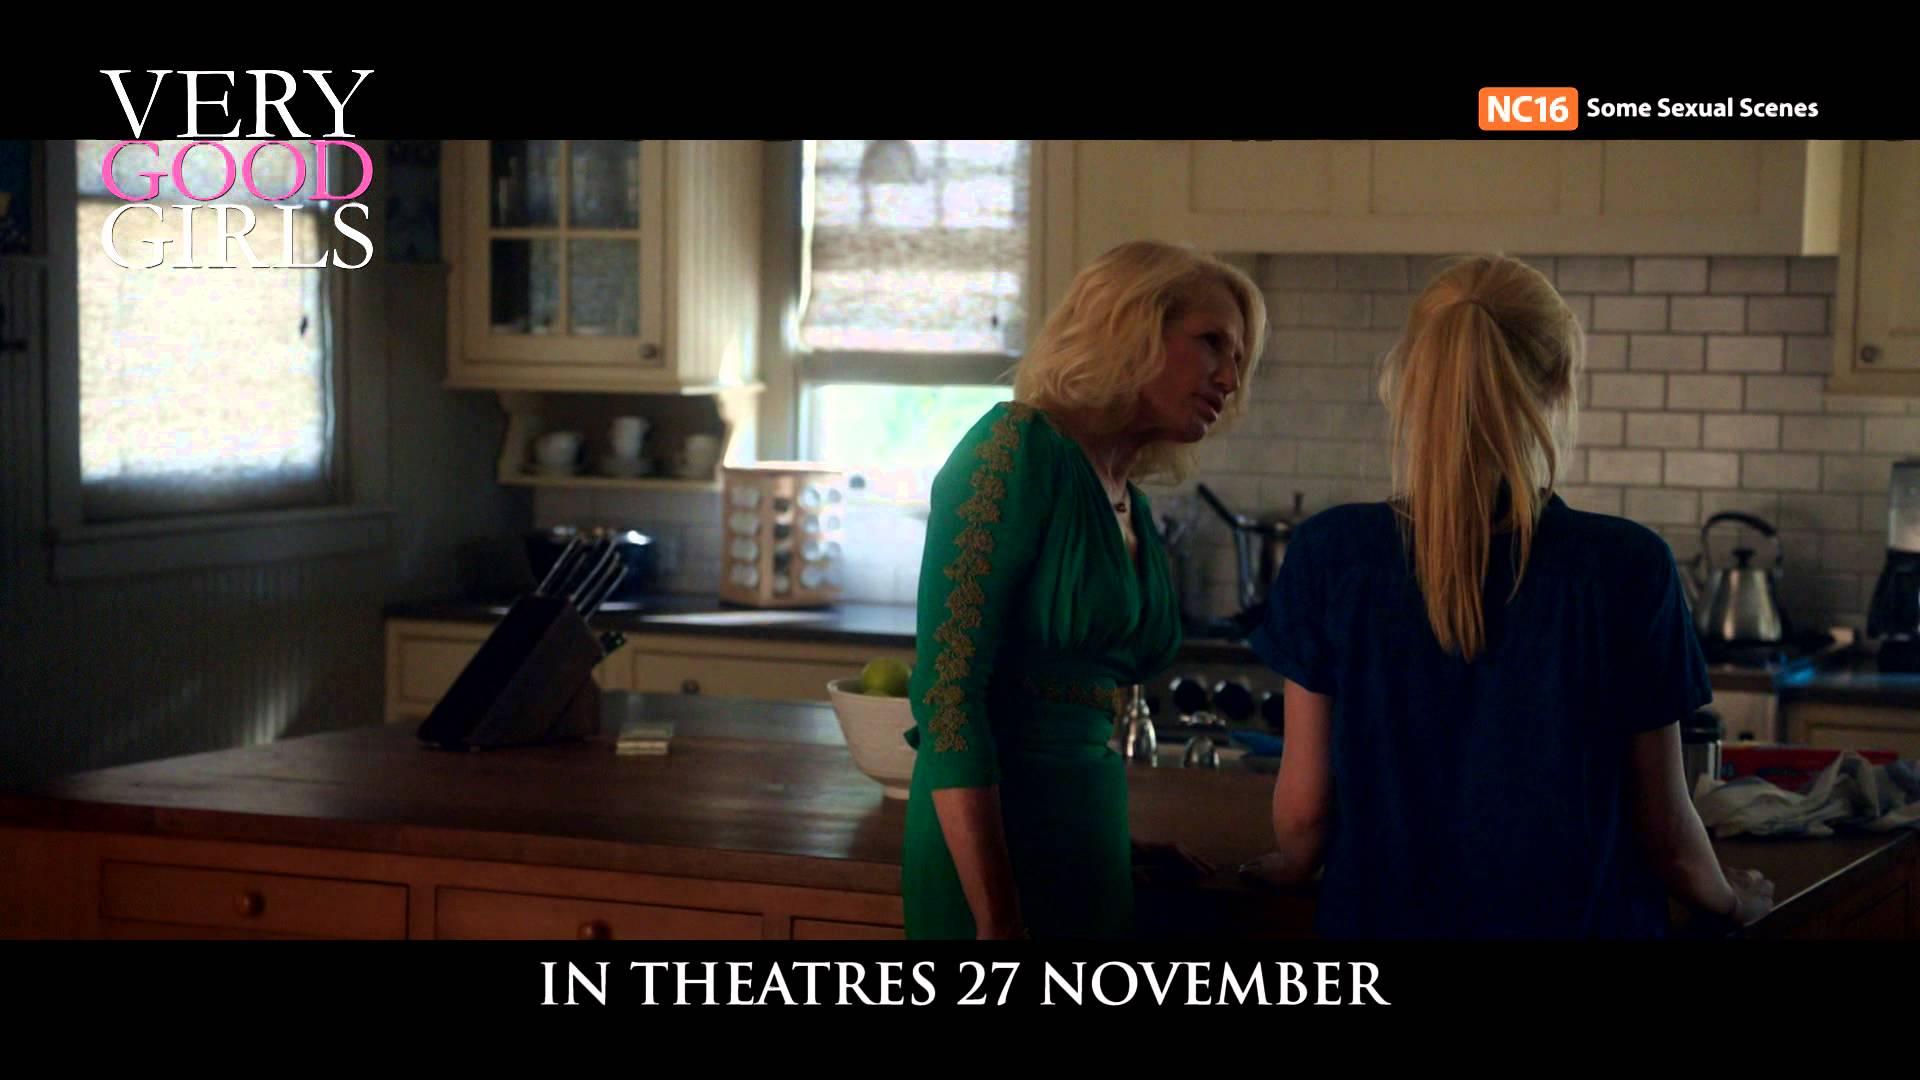 Very Good Girls Official Trailer